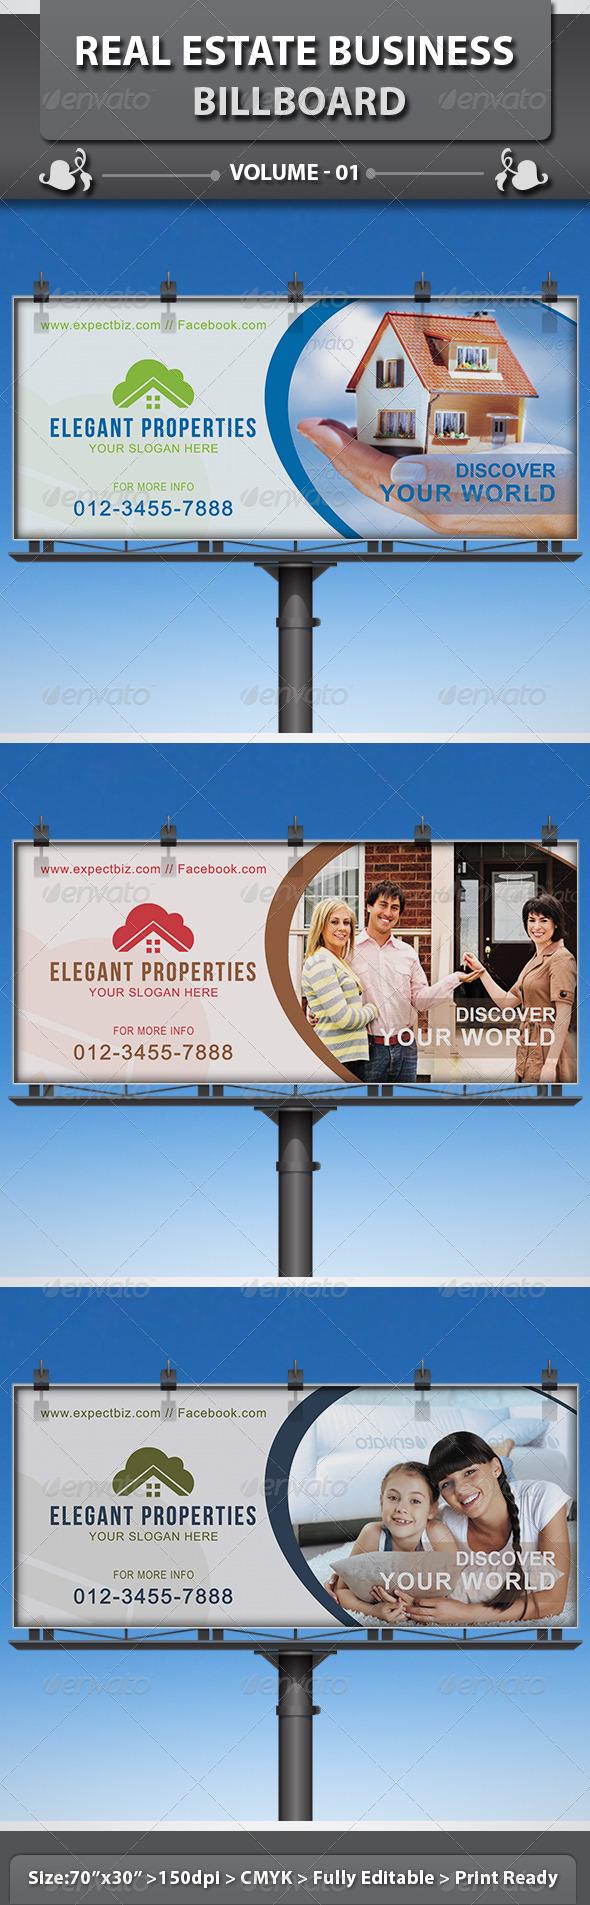 Real Estate Business Billboard | Volume 2 - Signage Print Templates